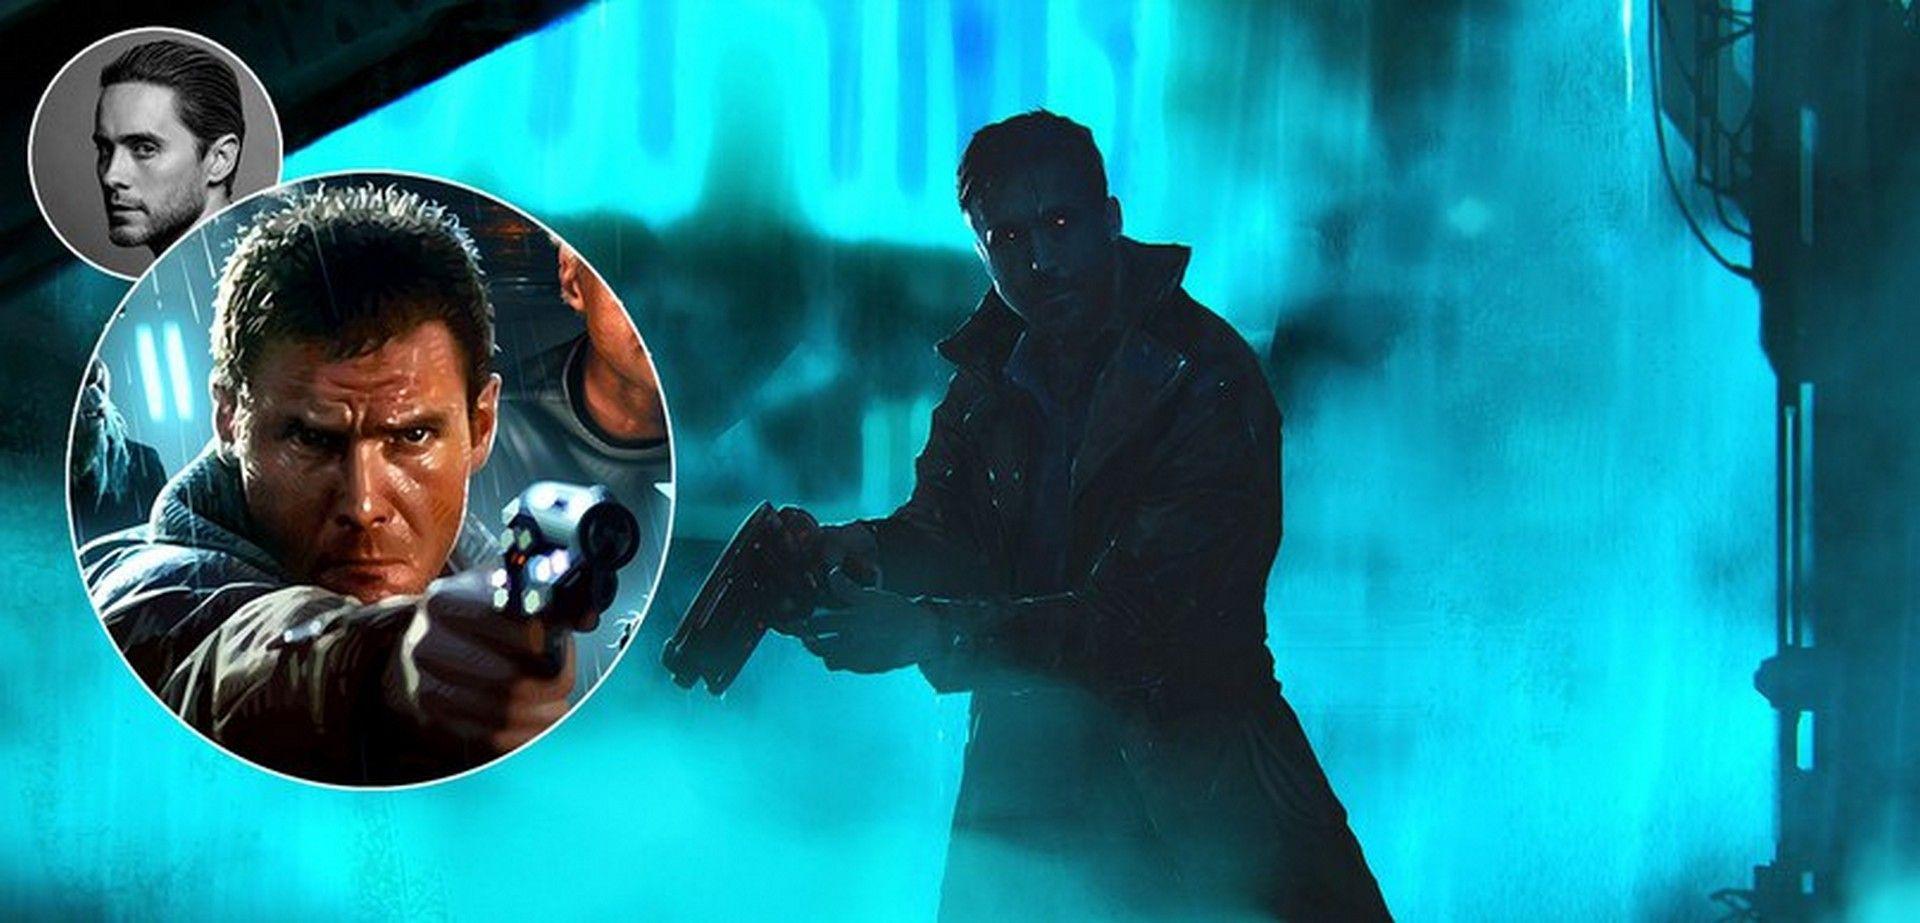 Blade Runner 2049 Wallpapers - Wallpaper Cave